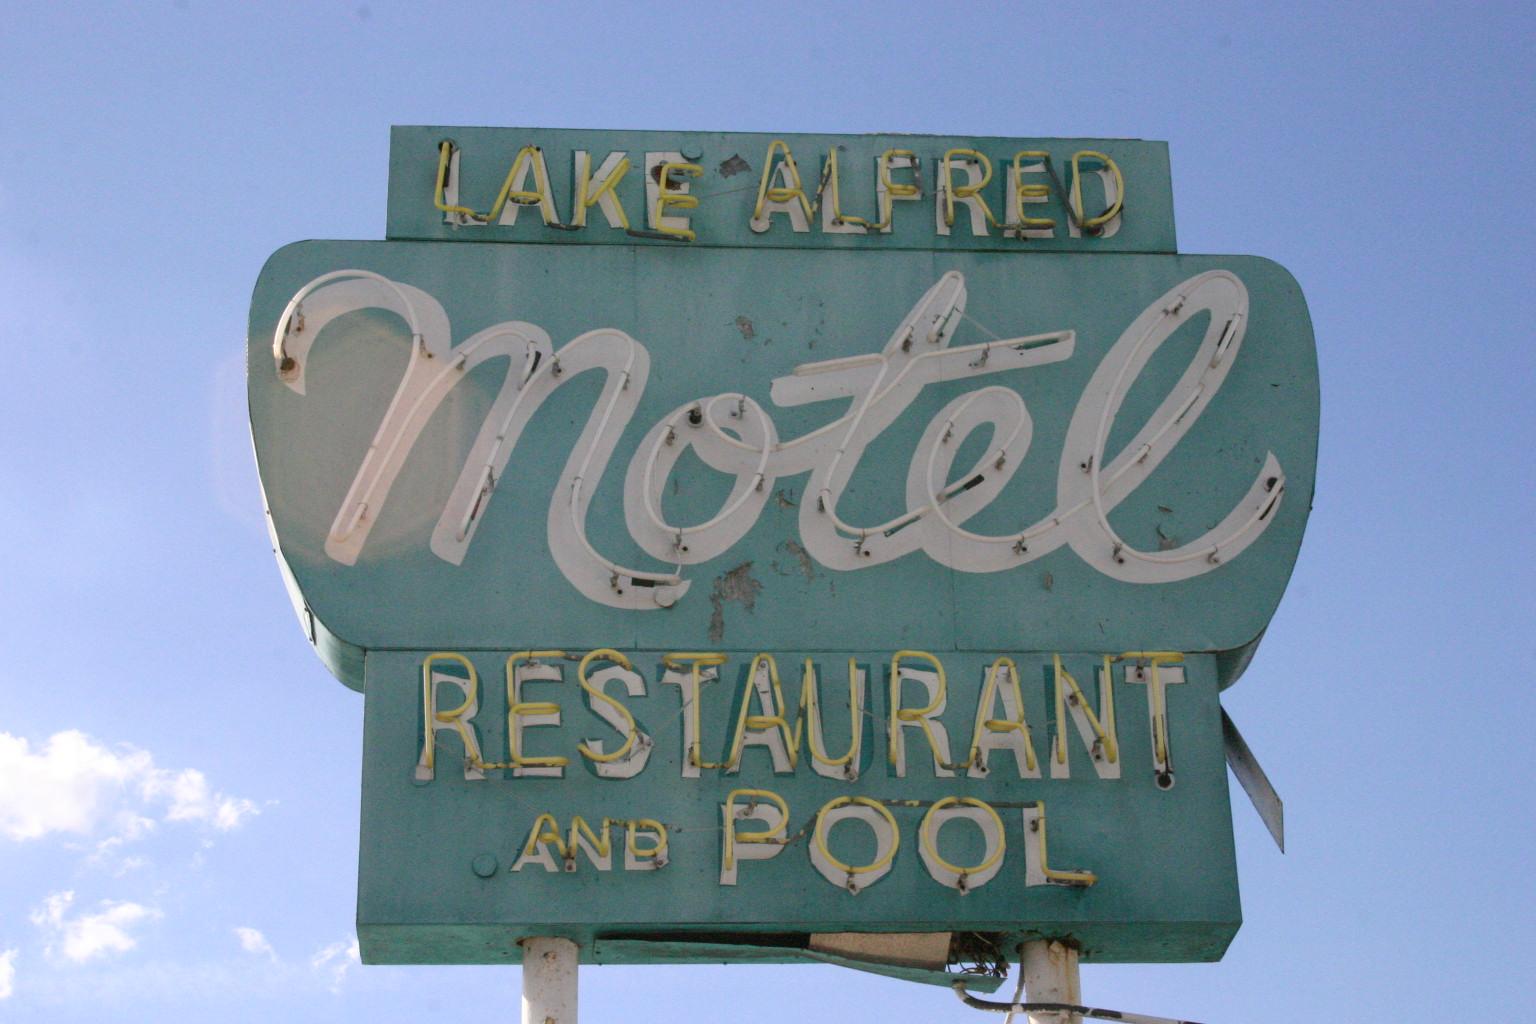 Lake Alfred Motel - Lake Alfred, Florida U.S.A. - January 10, 2008